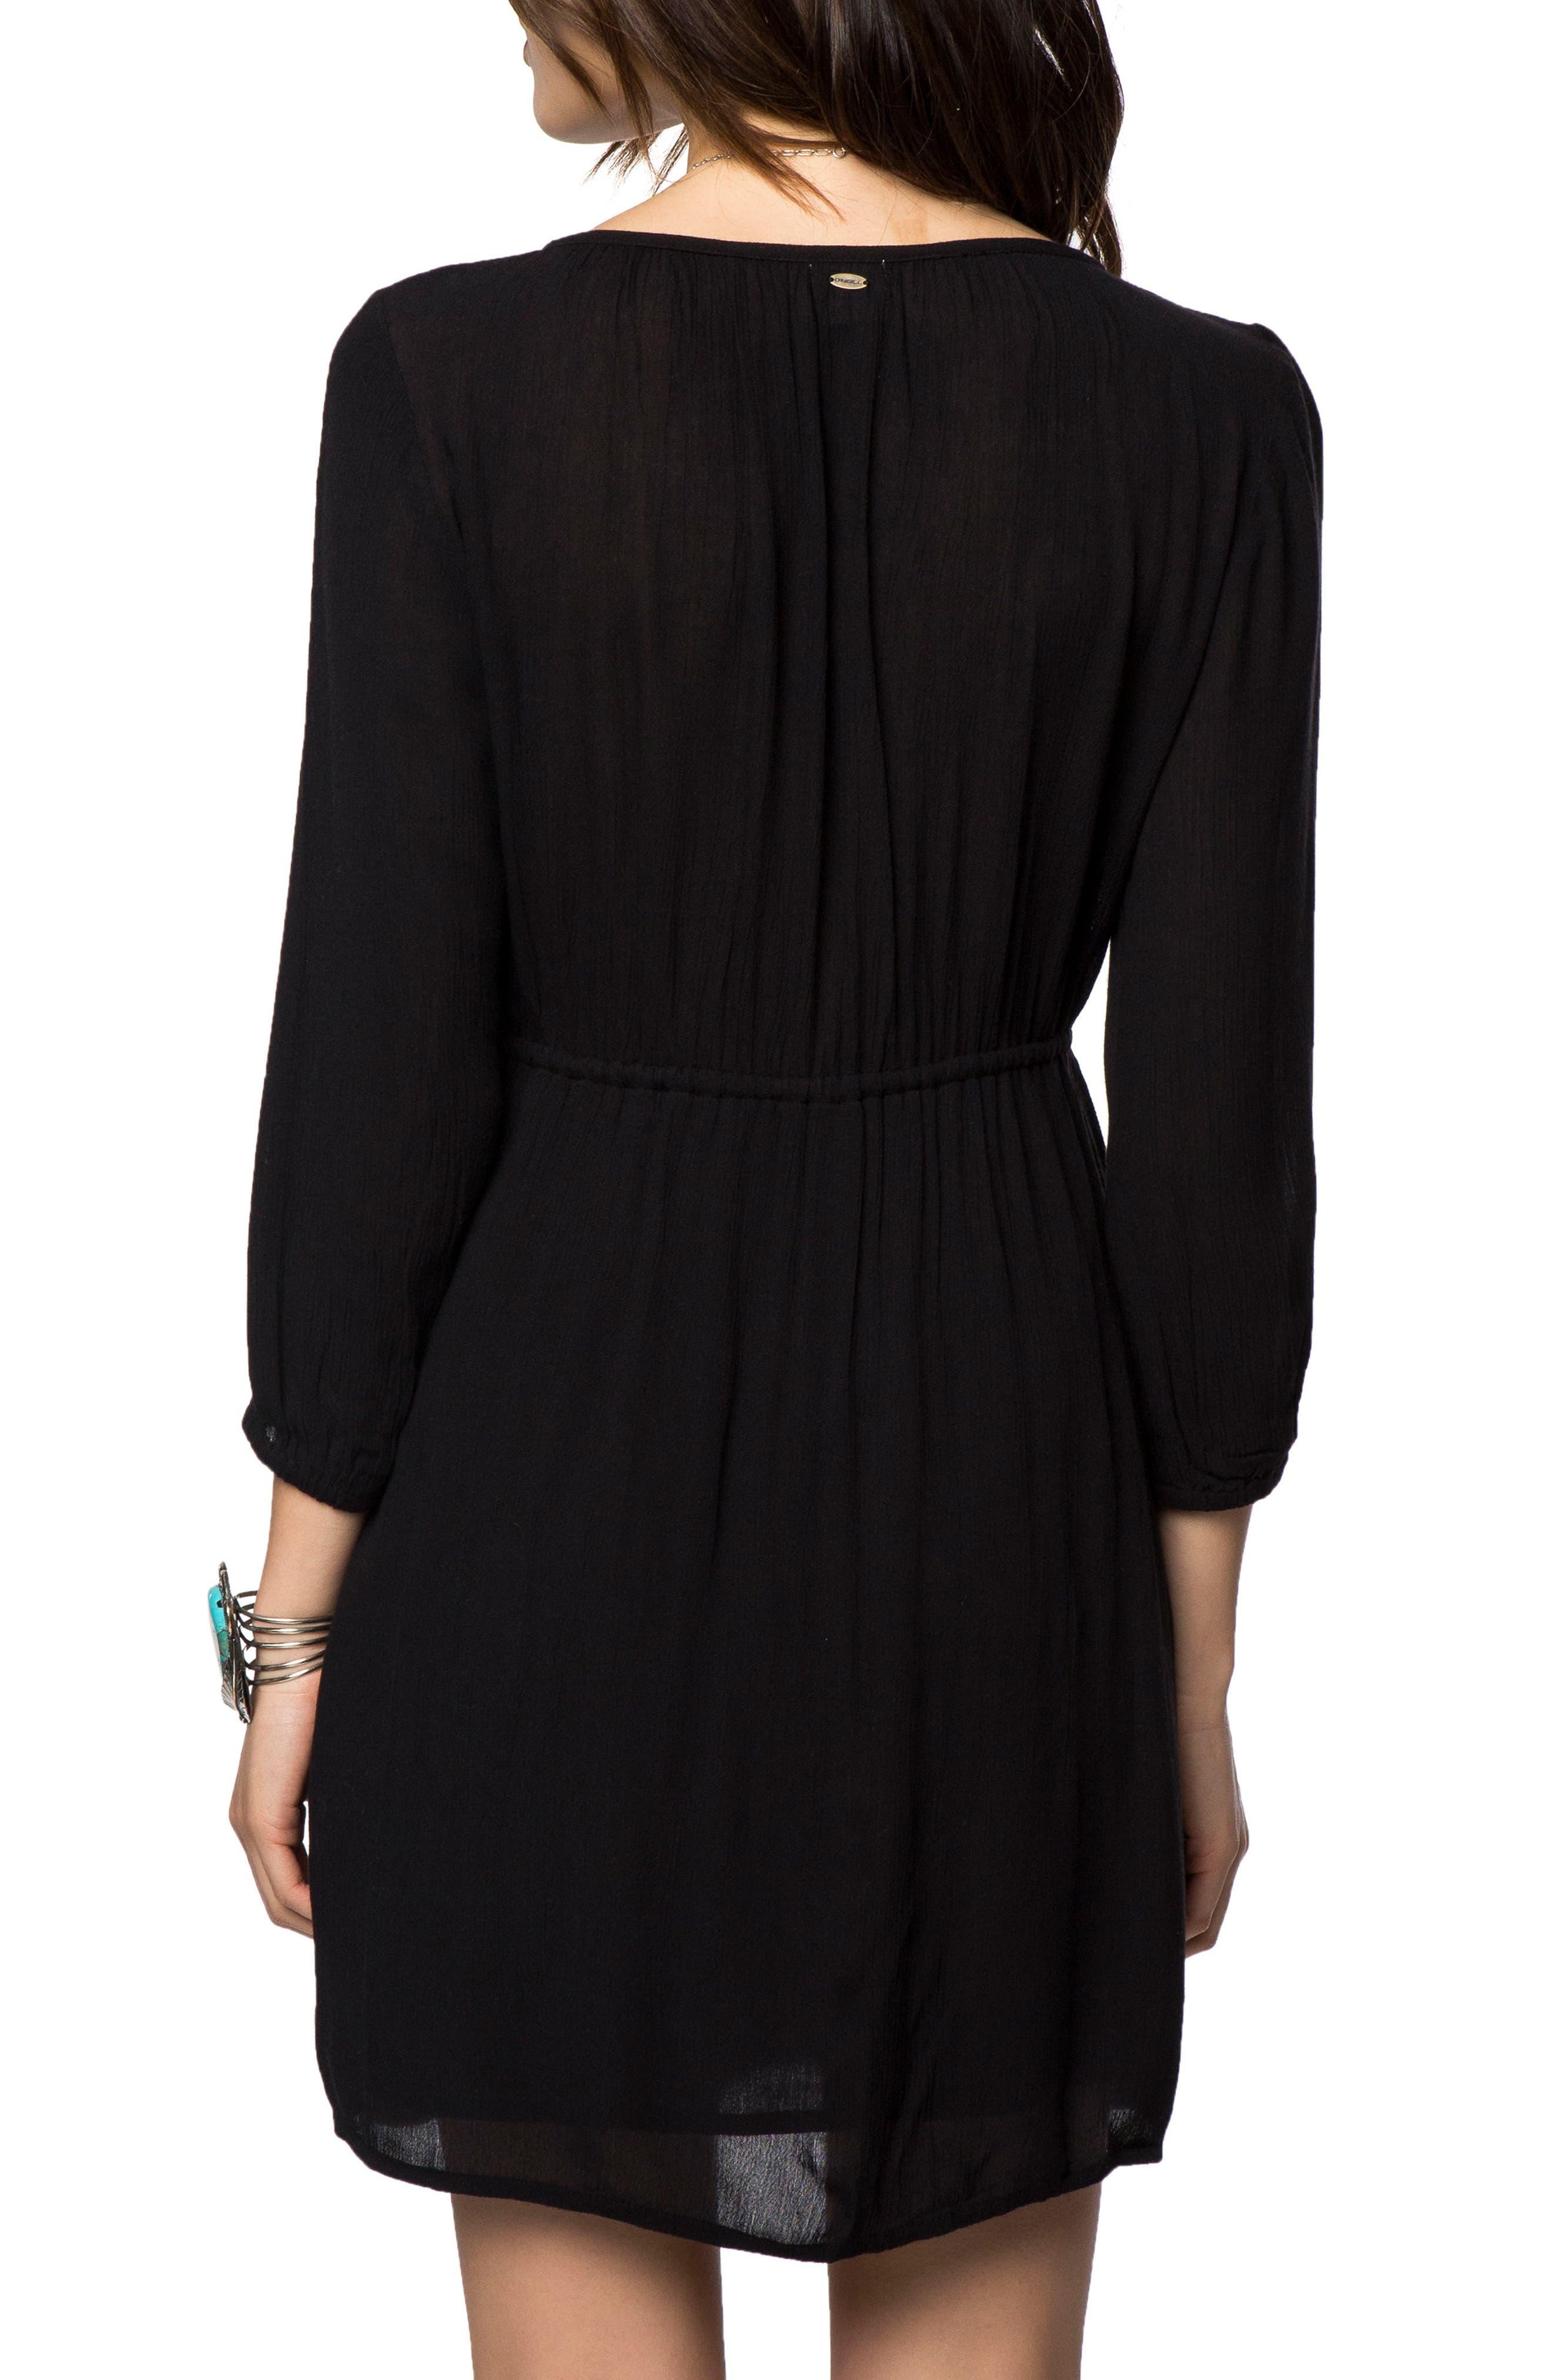 Mina Embroidered Minidress,                             Alternate thumbnail 2, color,                             Black